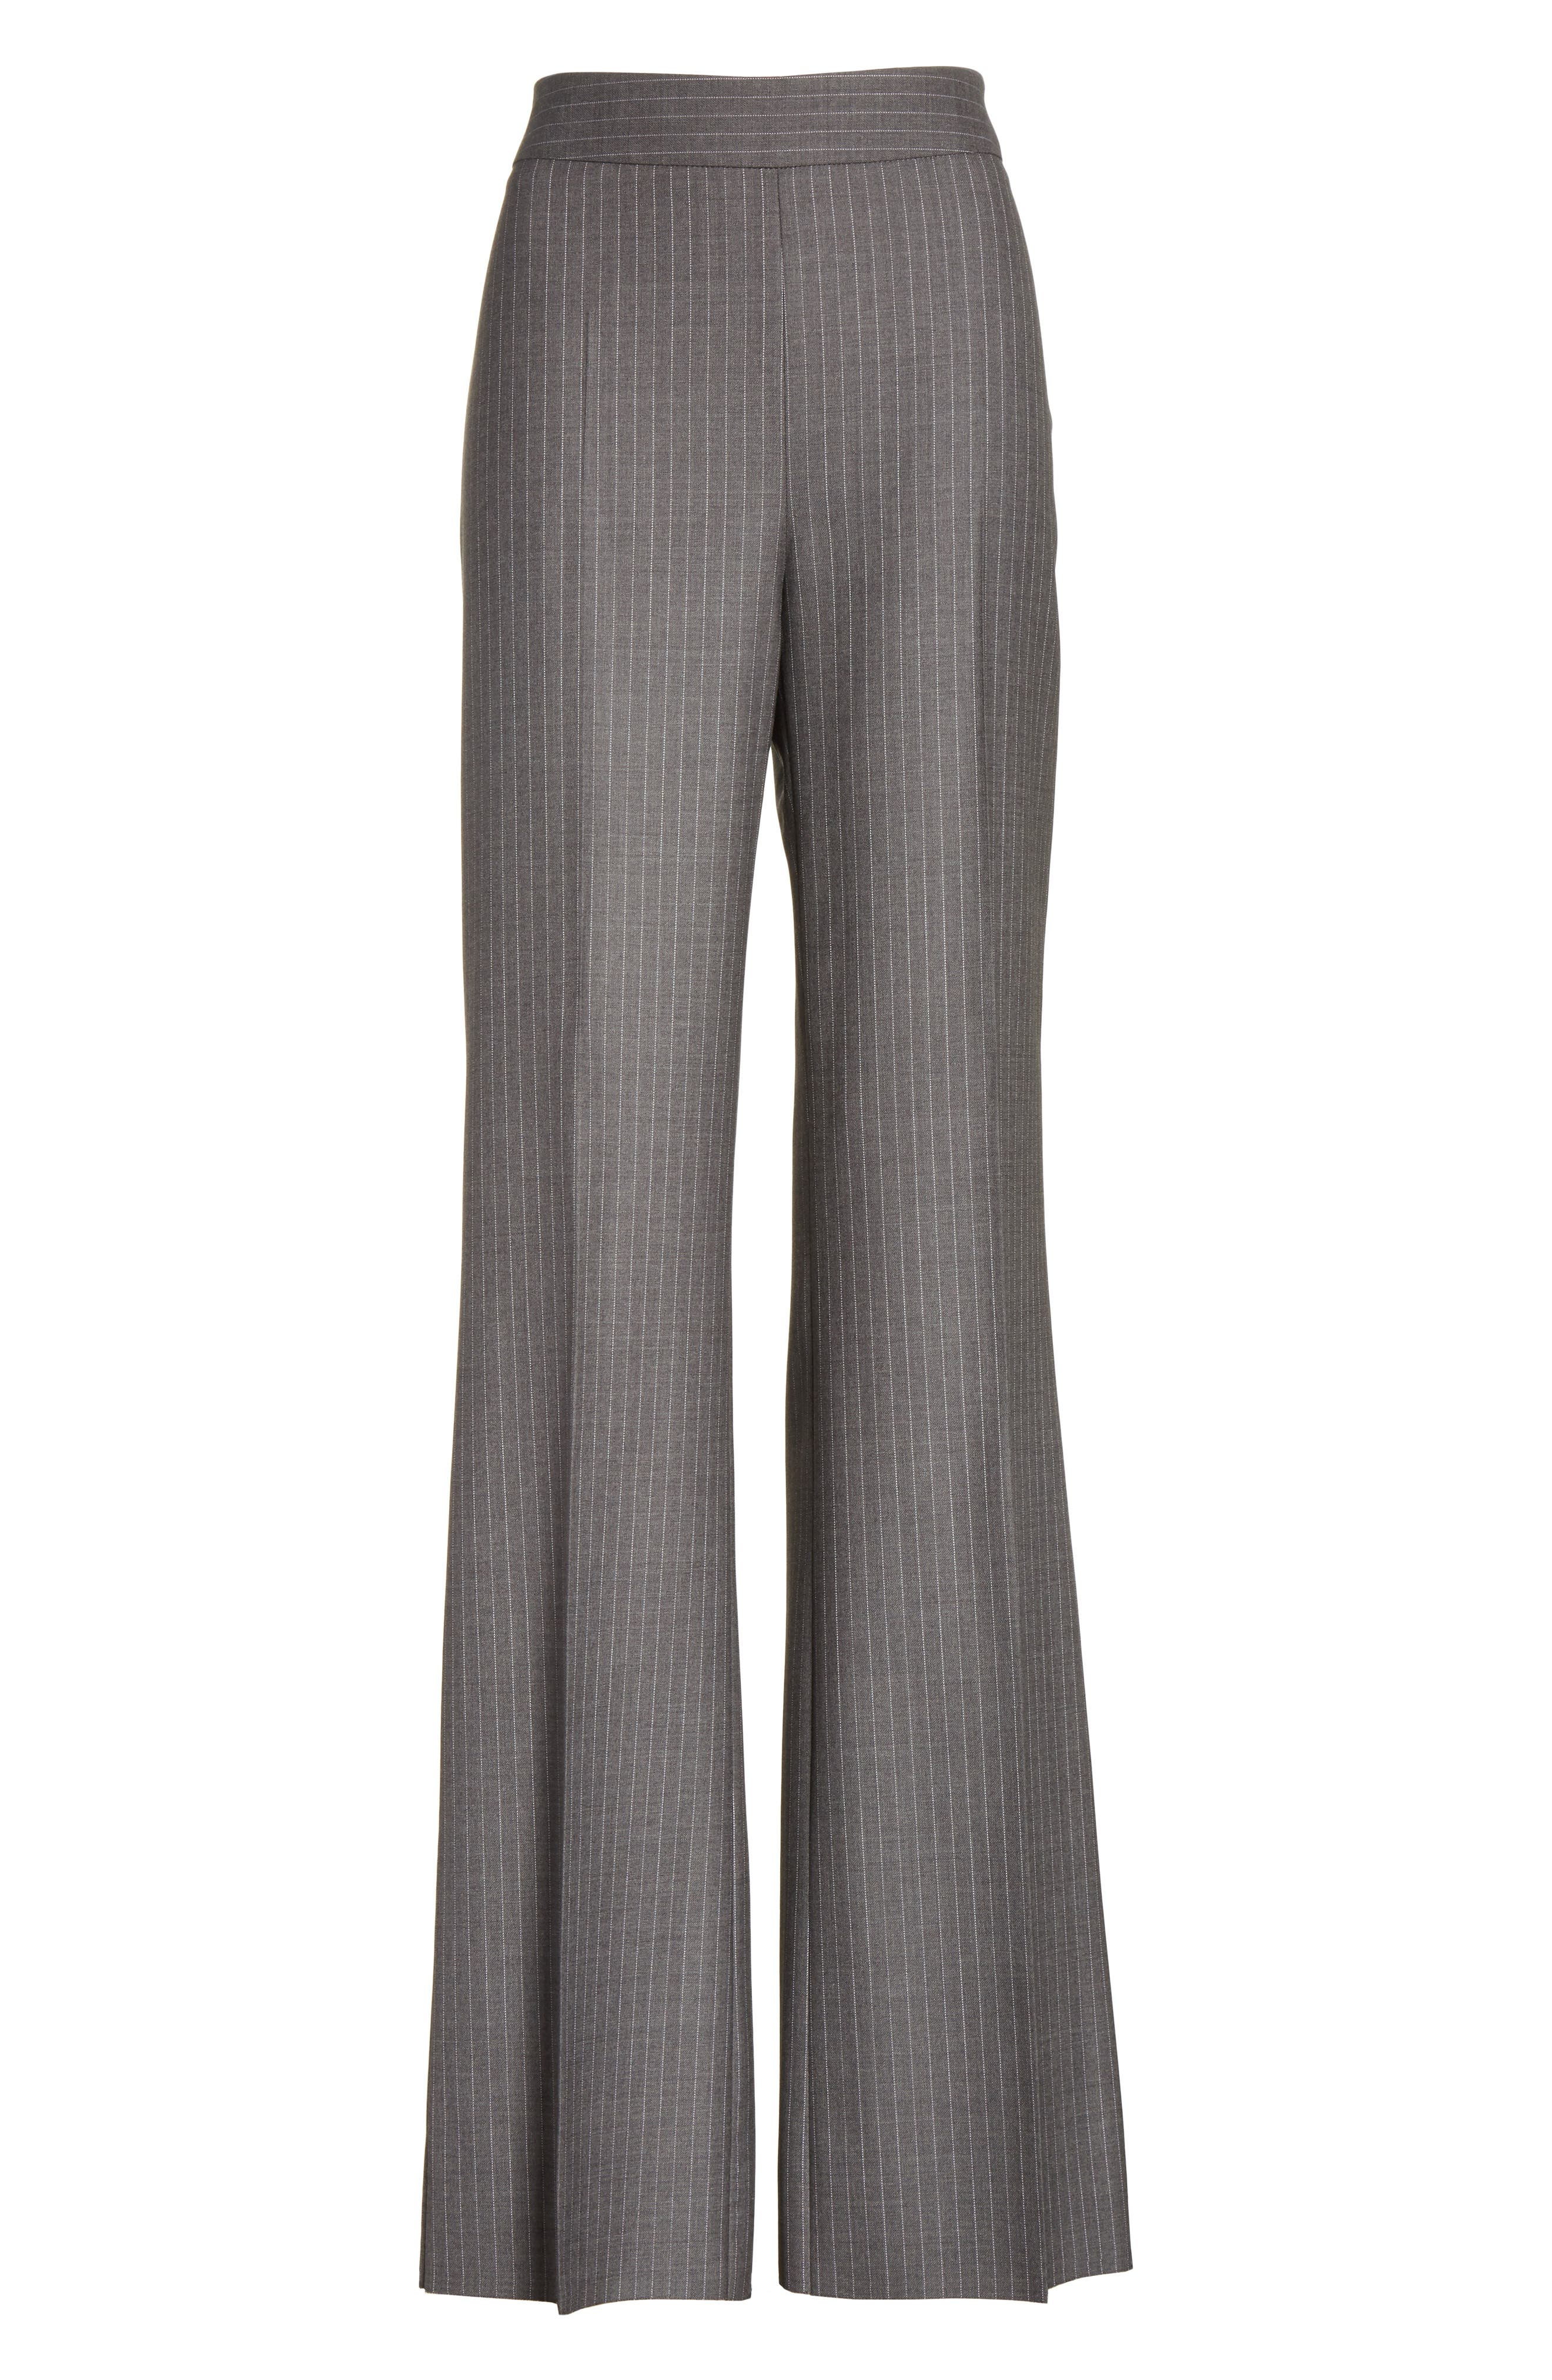 Garibo Stretch Wool Pinstripe Pants,                             Alternate thumbnail 6, color,                             034